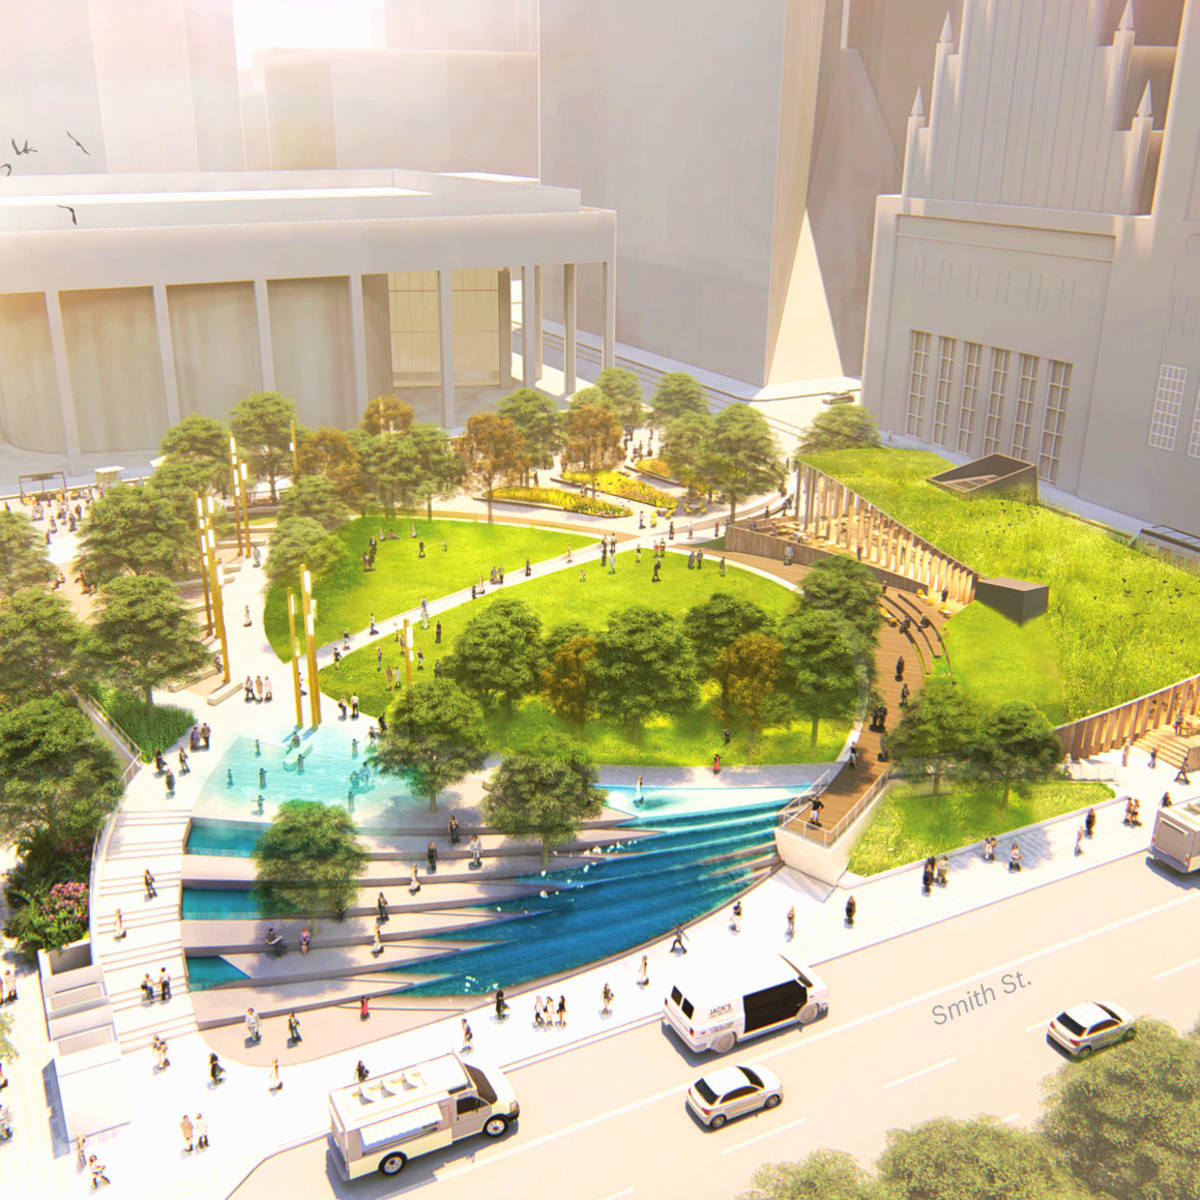 Jones Plaza redevelopment aerial